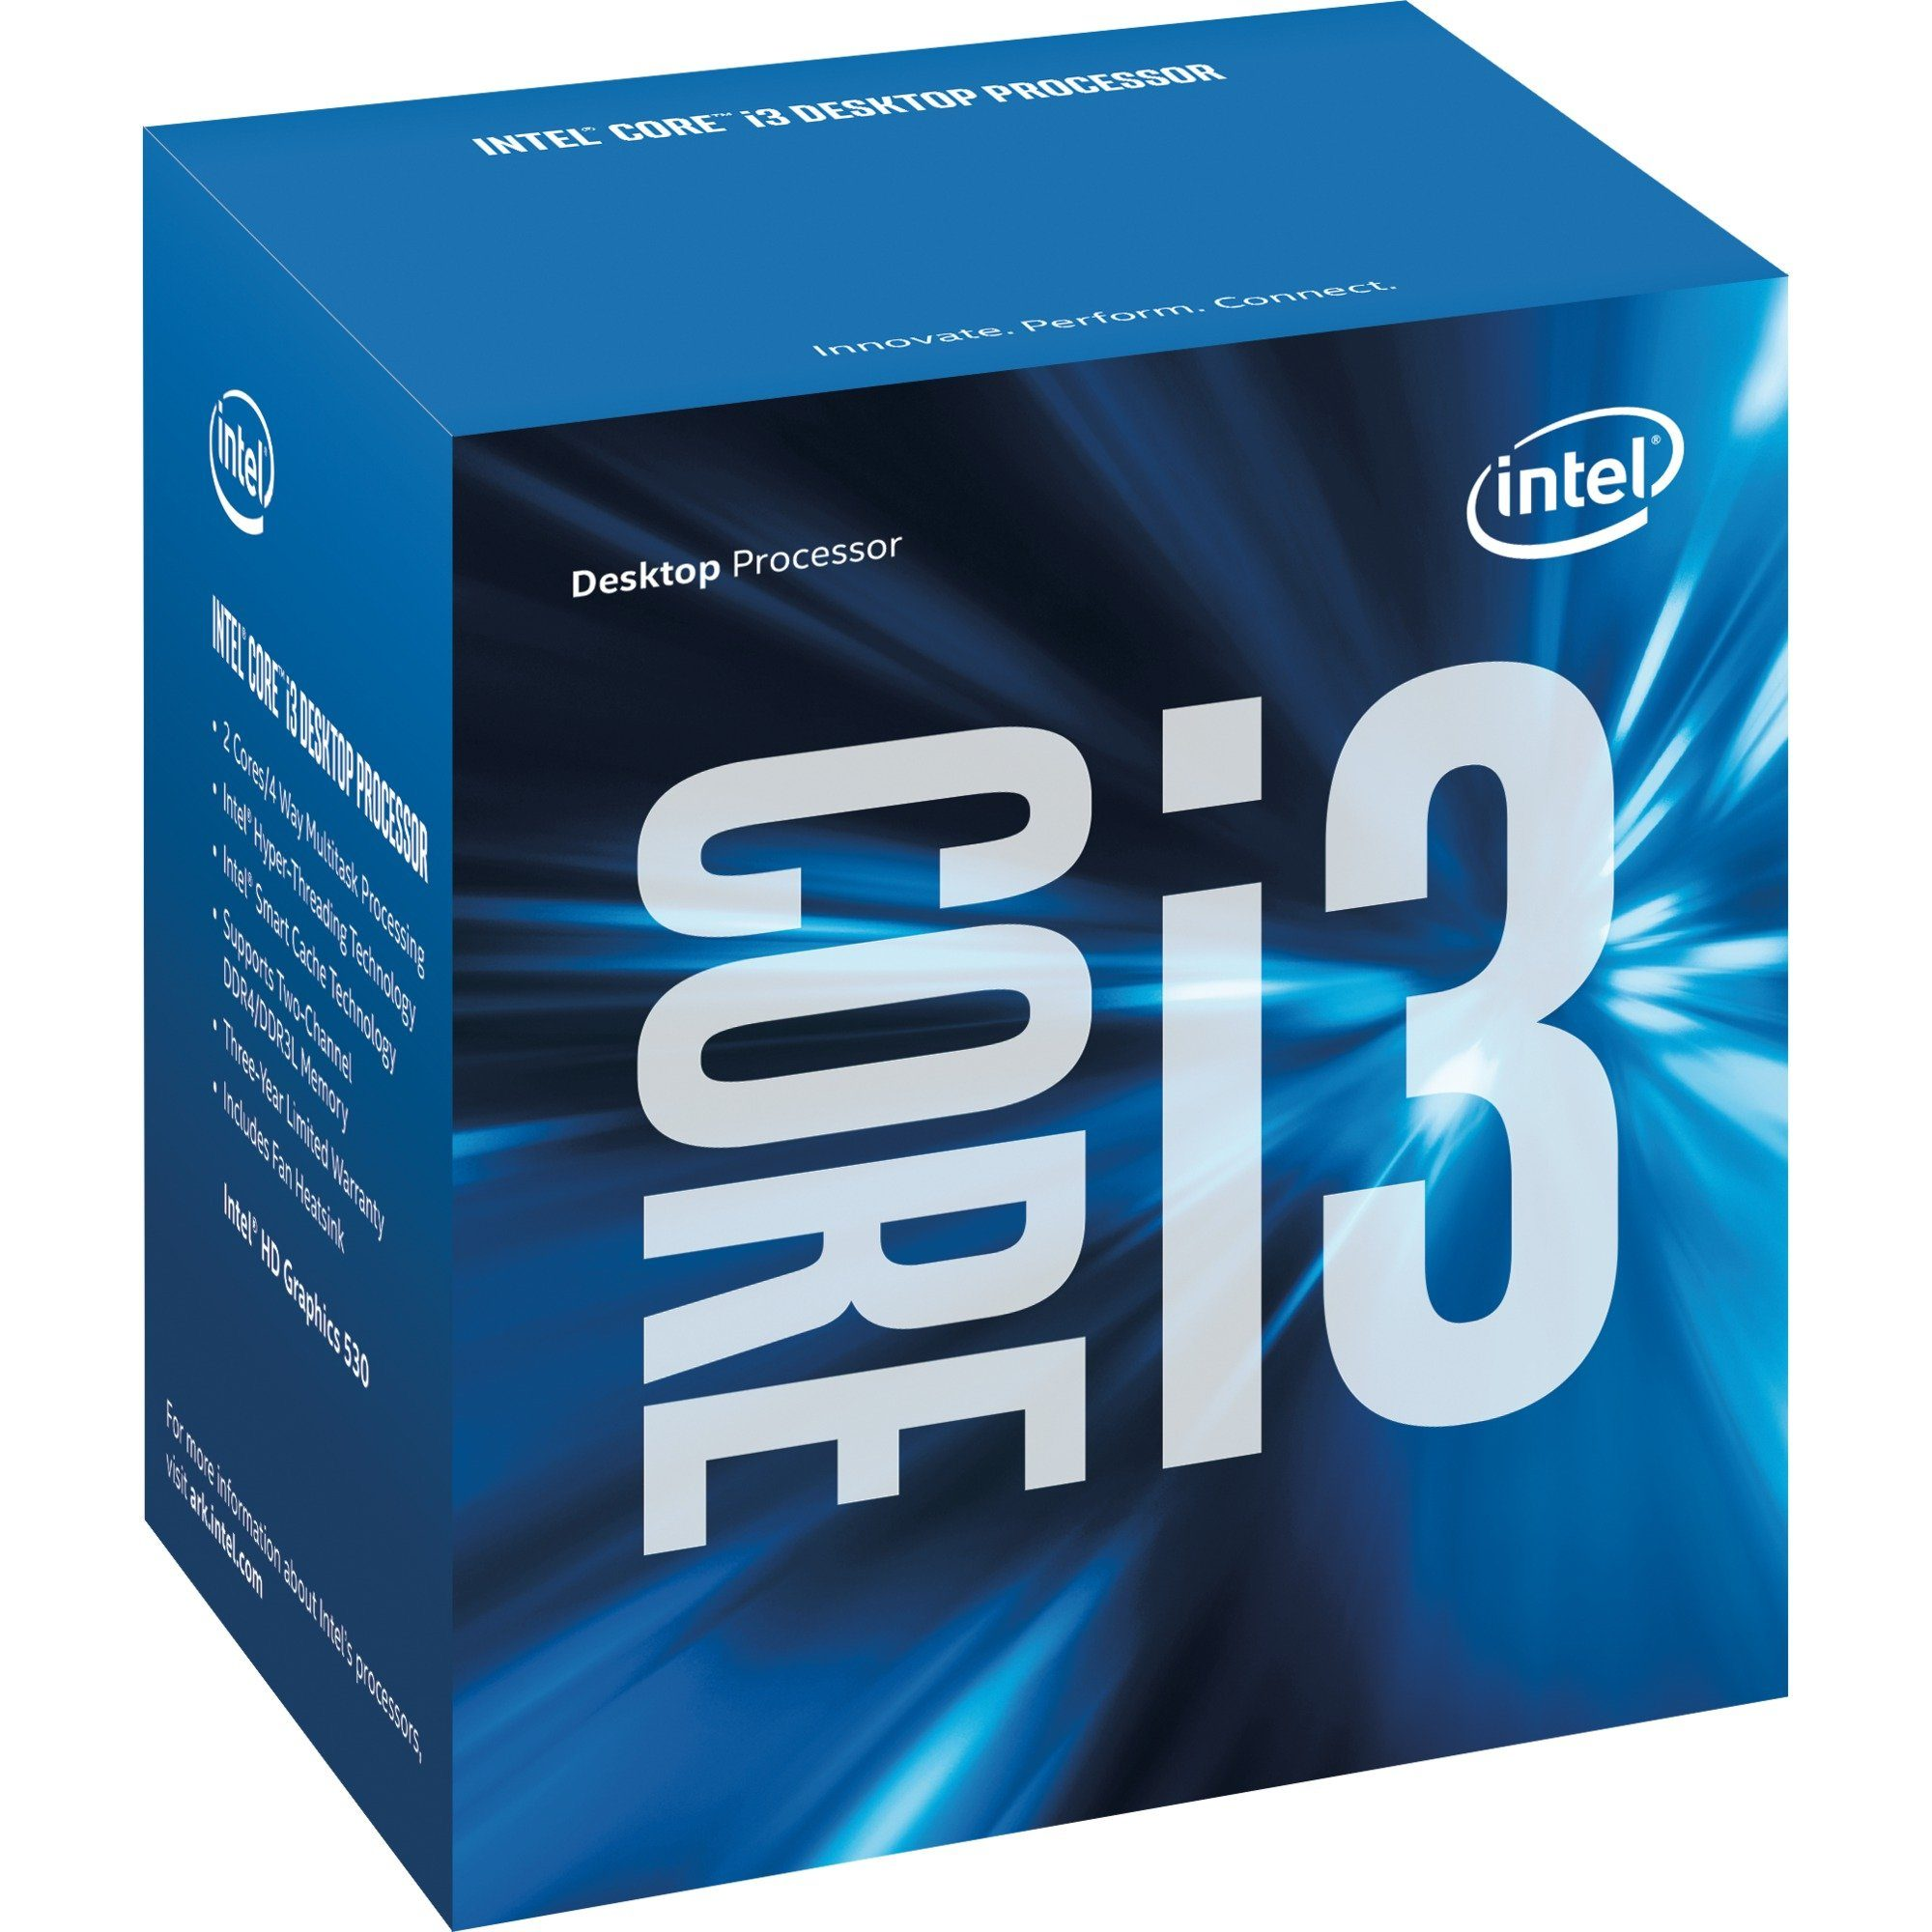 Intel® Prozessor »Core(TM) i3-6100T«